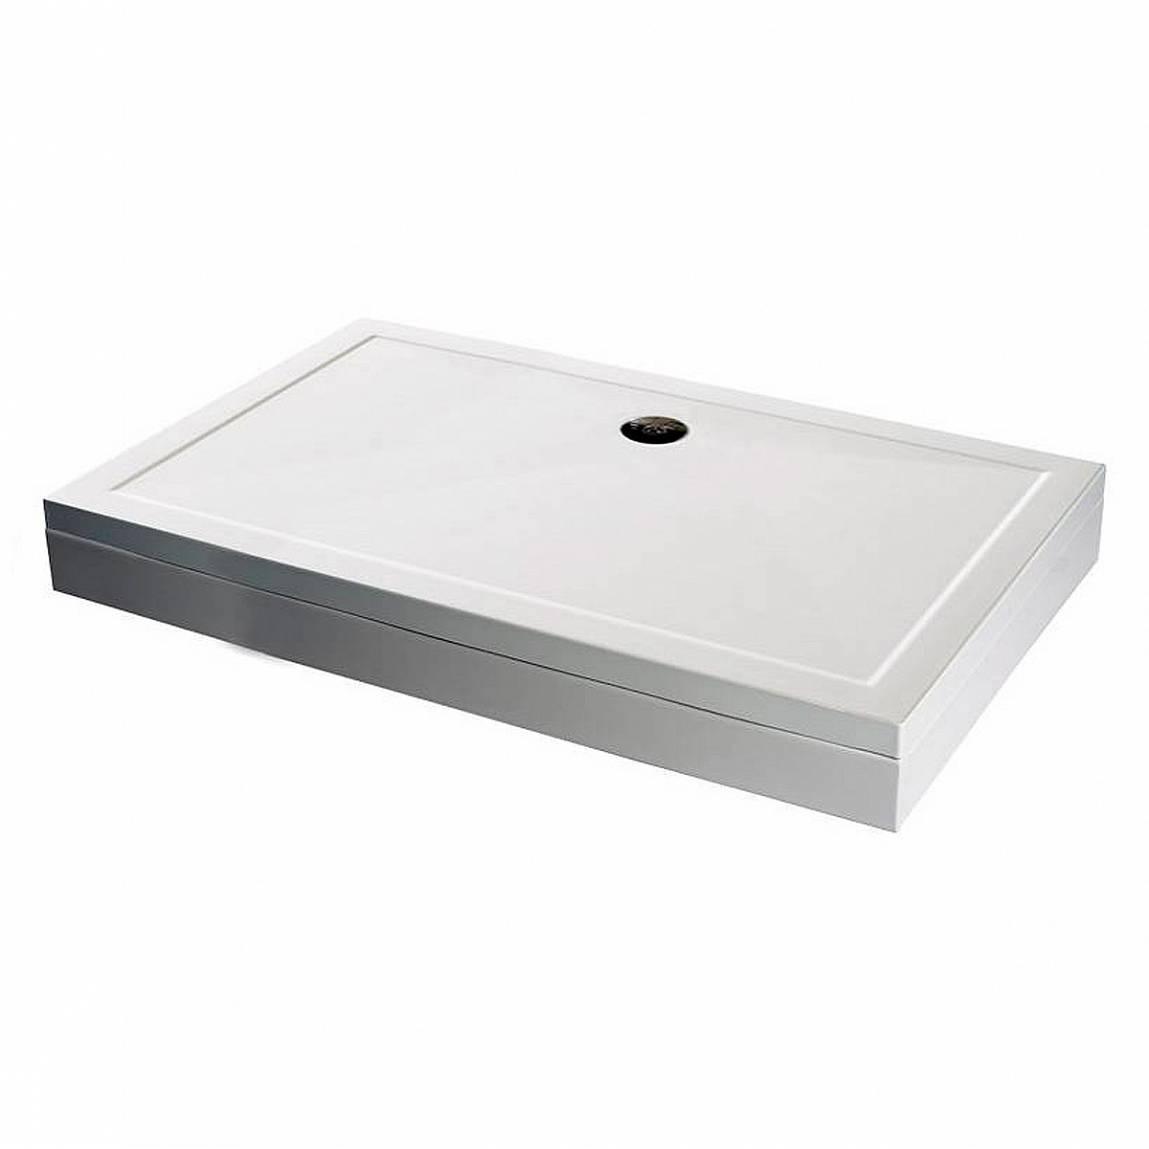 Image of Rectangular Stone Shower Tray & Riser Kit 800 x 760